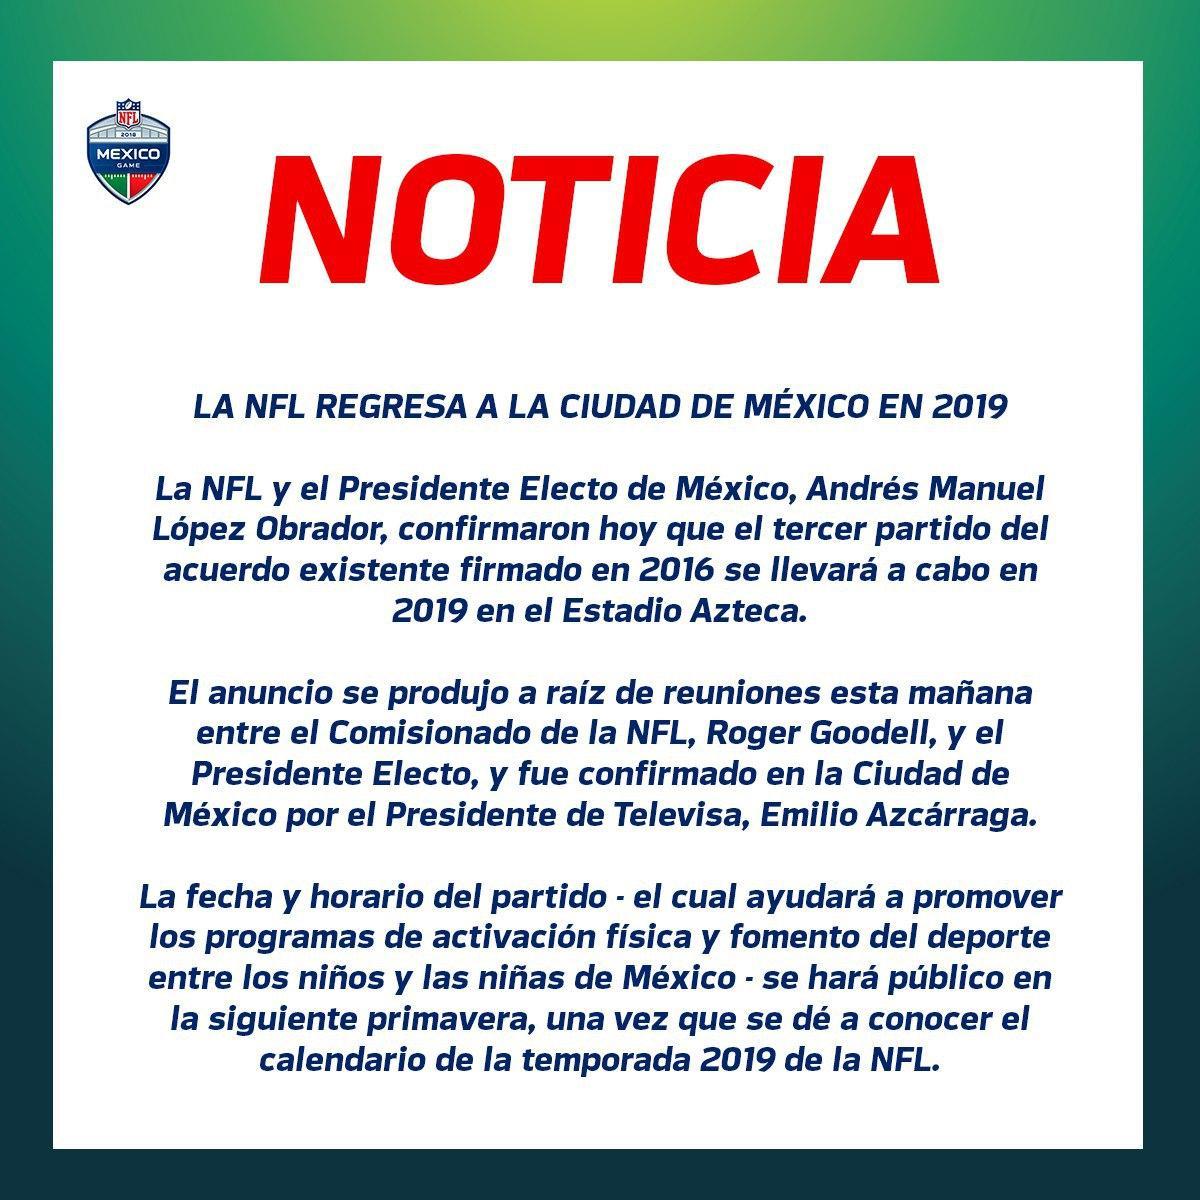 NFL confirma que regresará a México en 2019